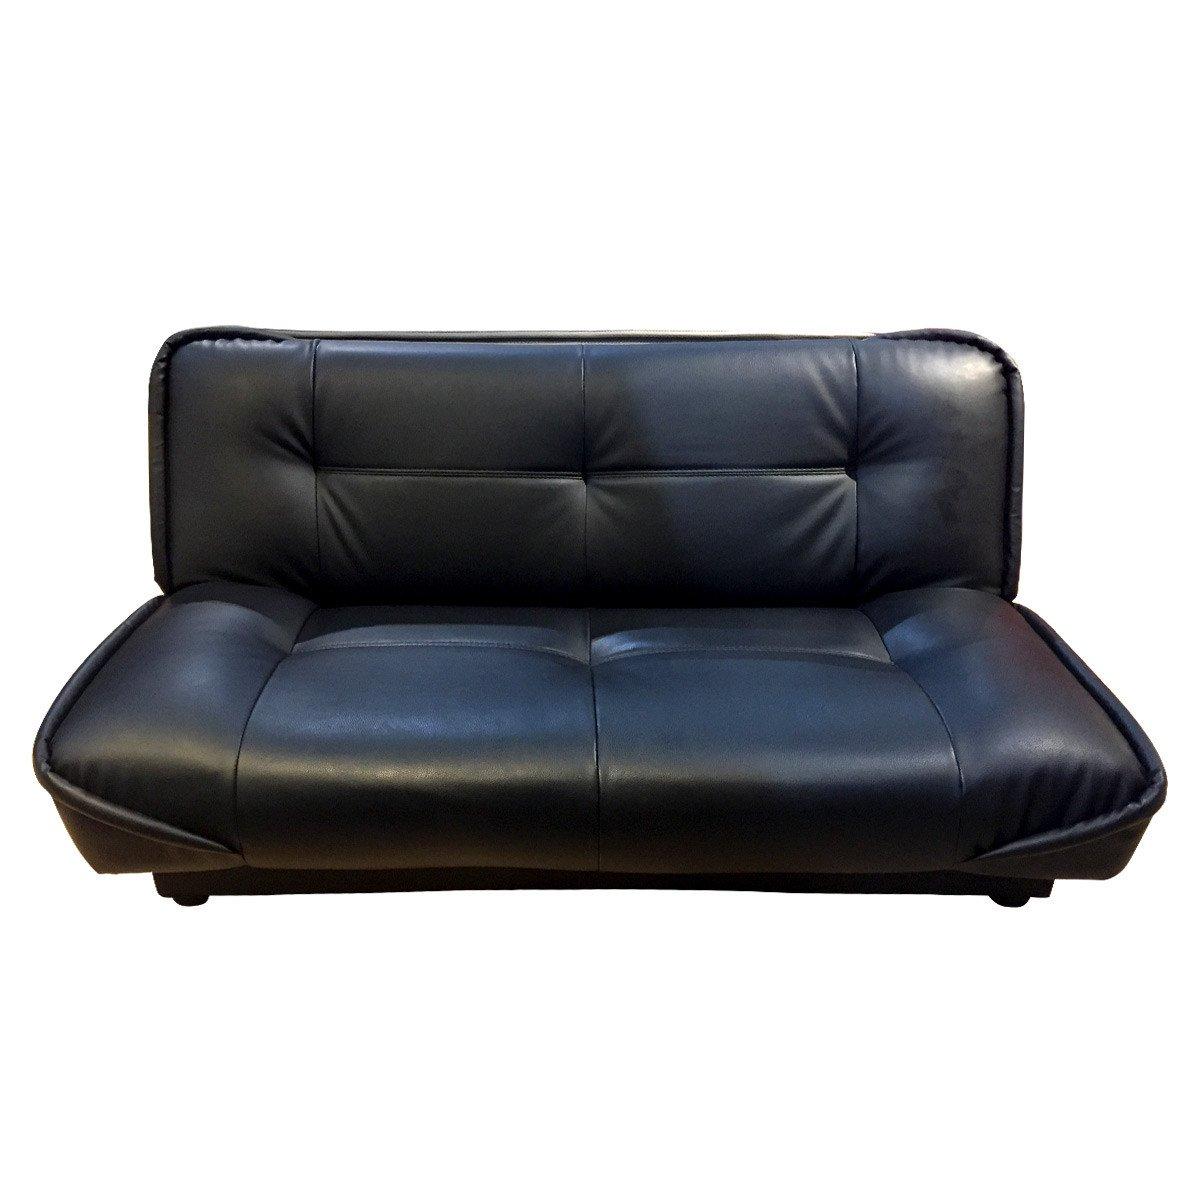 Furniture Sofa Mattress Bed